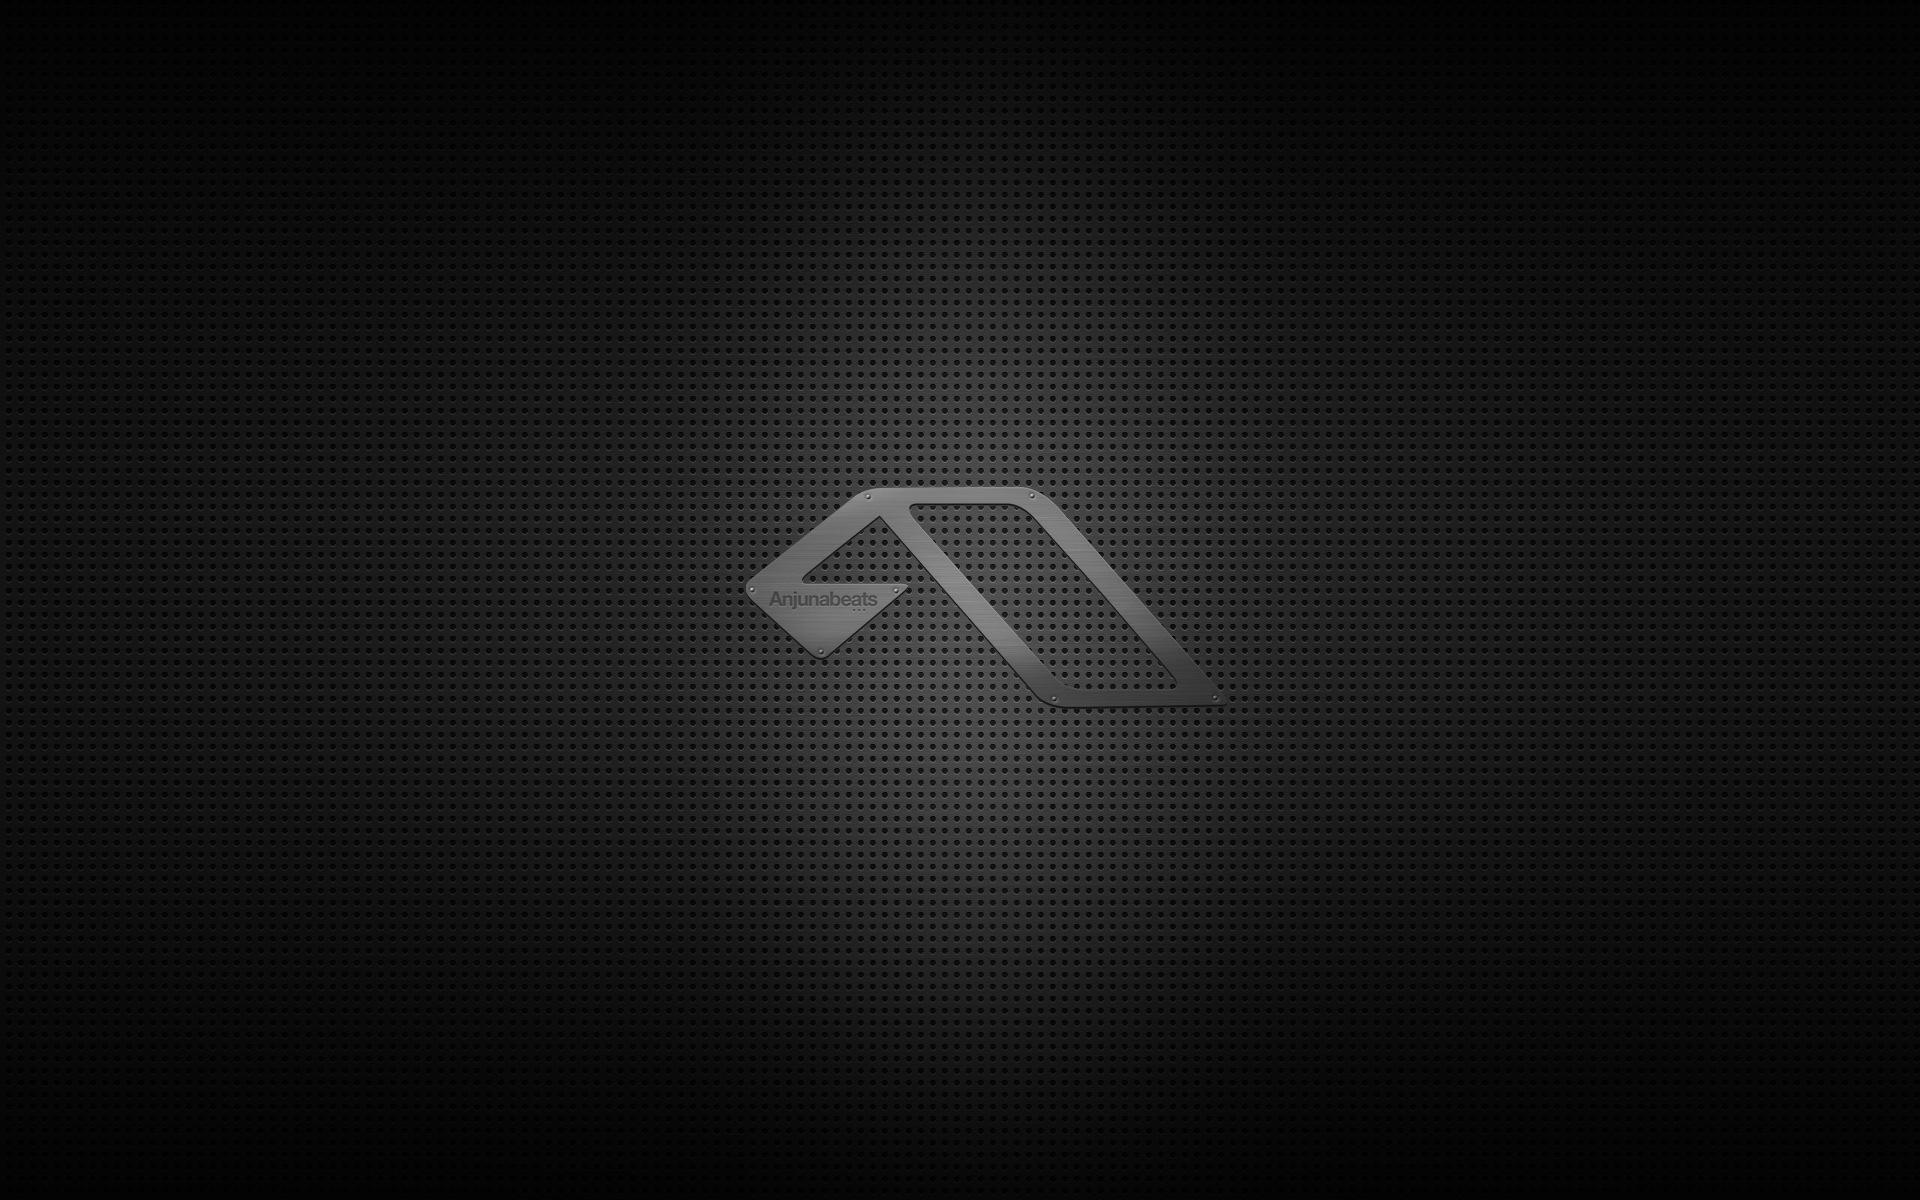 Anjunabeats 黑色主题壁纸 (多分辨率)(壁纸7)